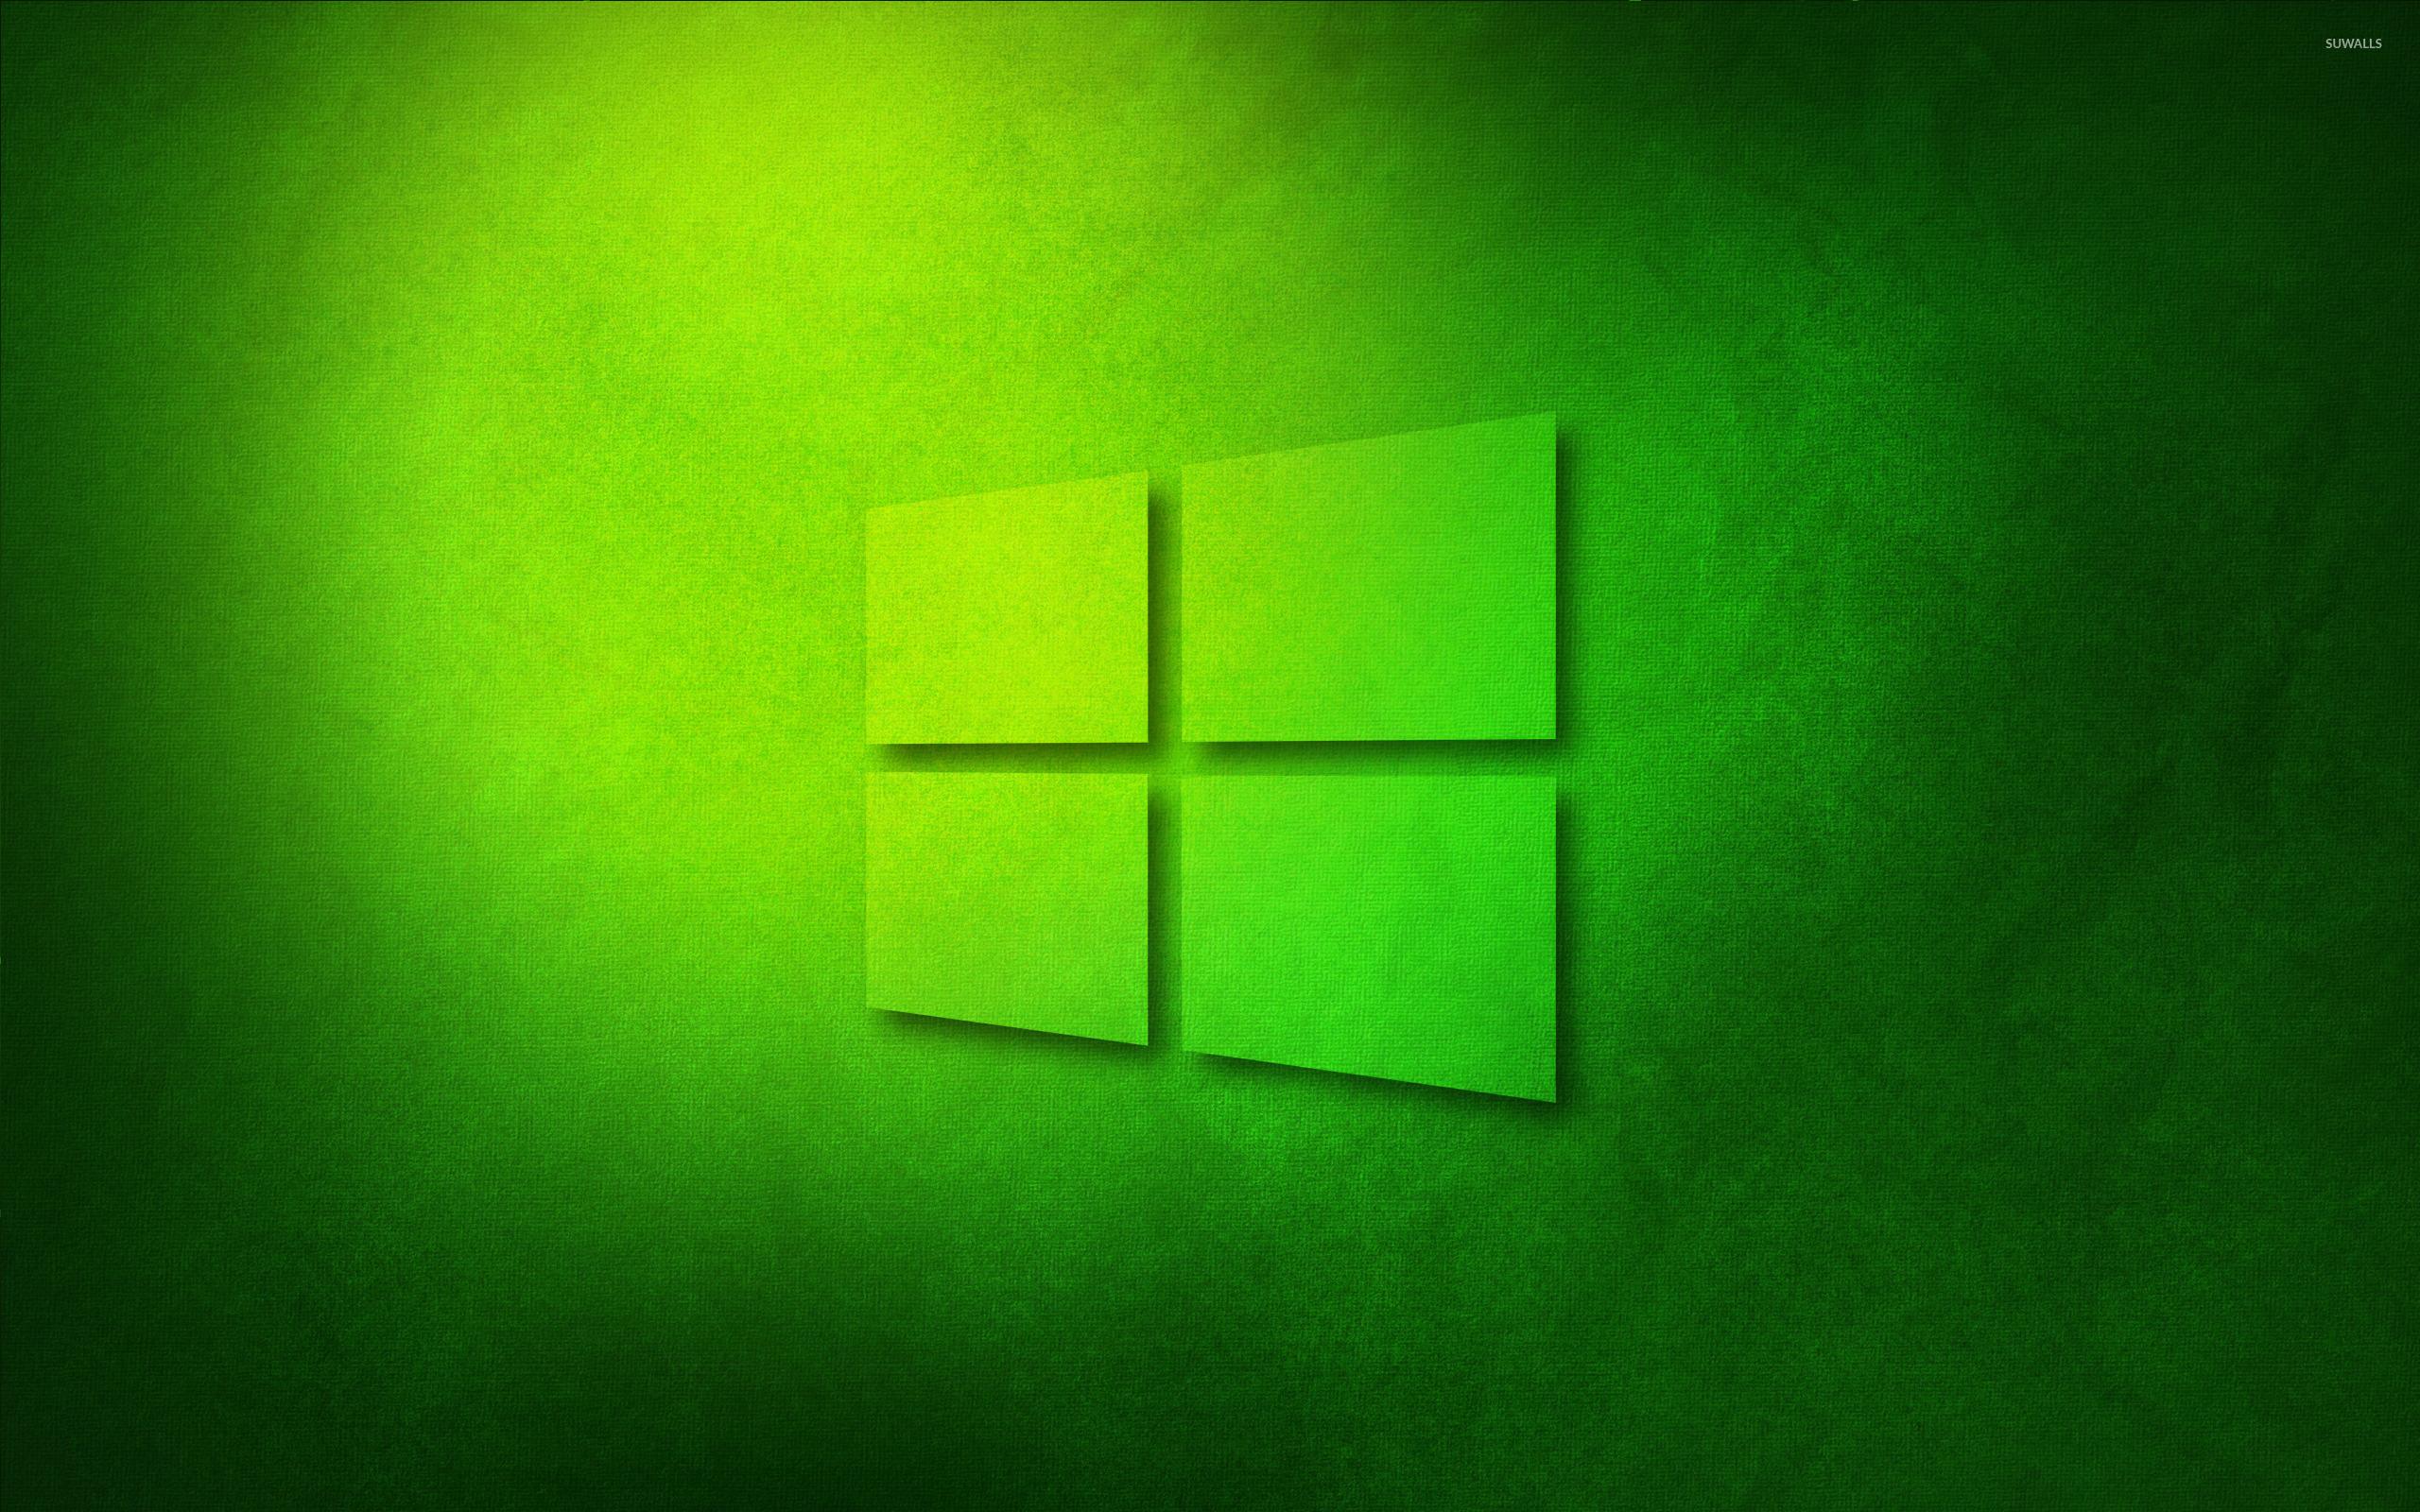 Windows 10 transparent logo on green paper wallpaper 1680x1050 1680x1050